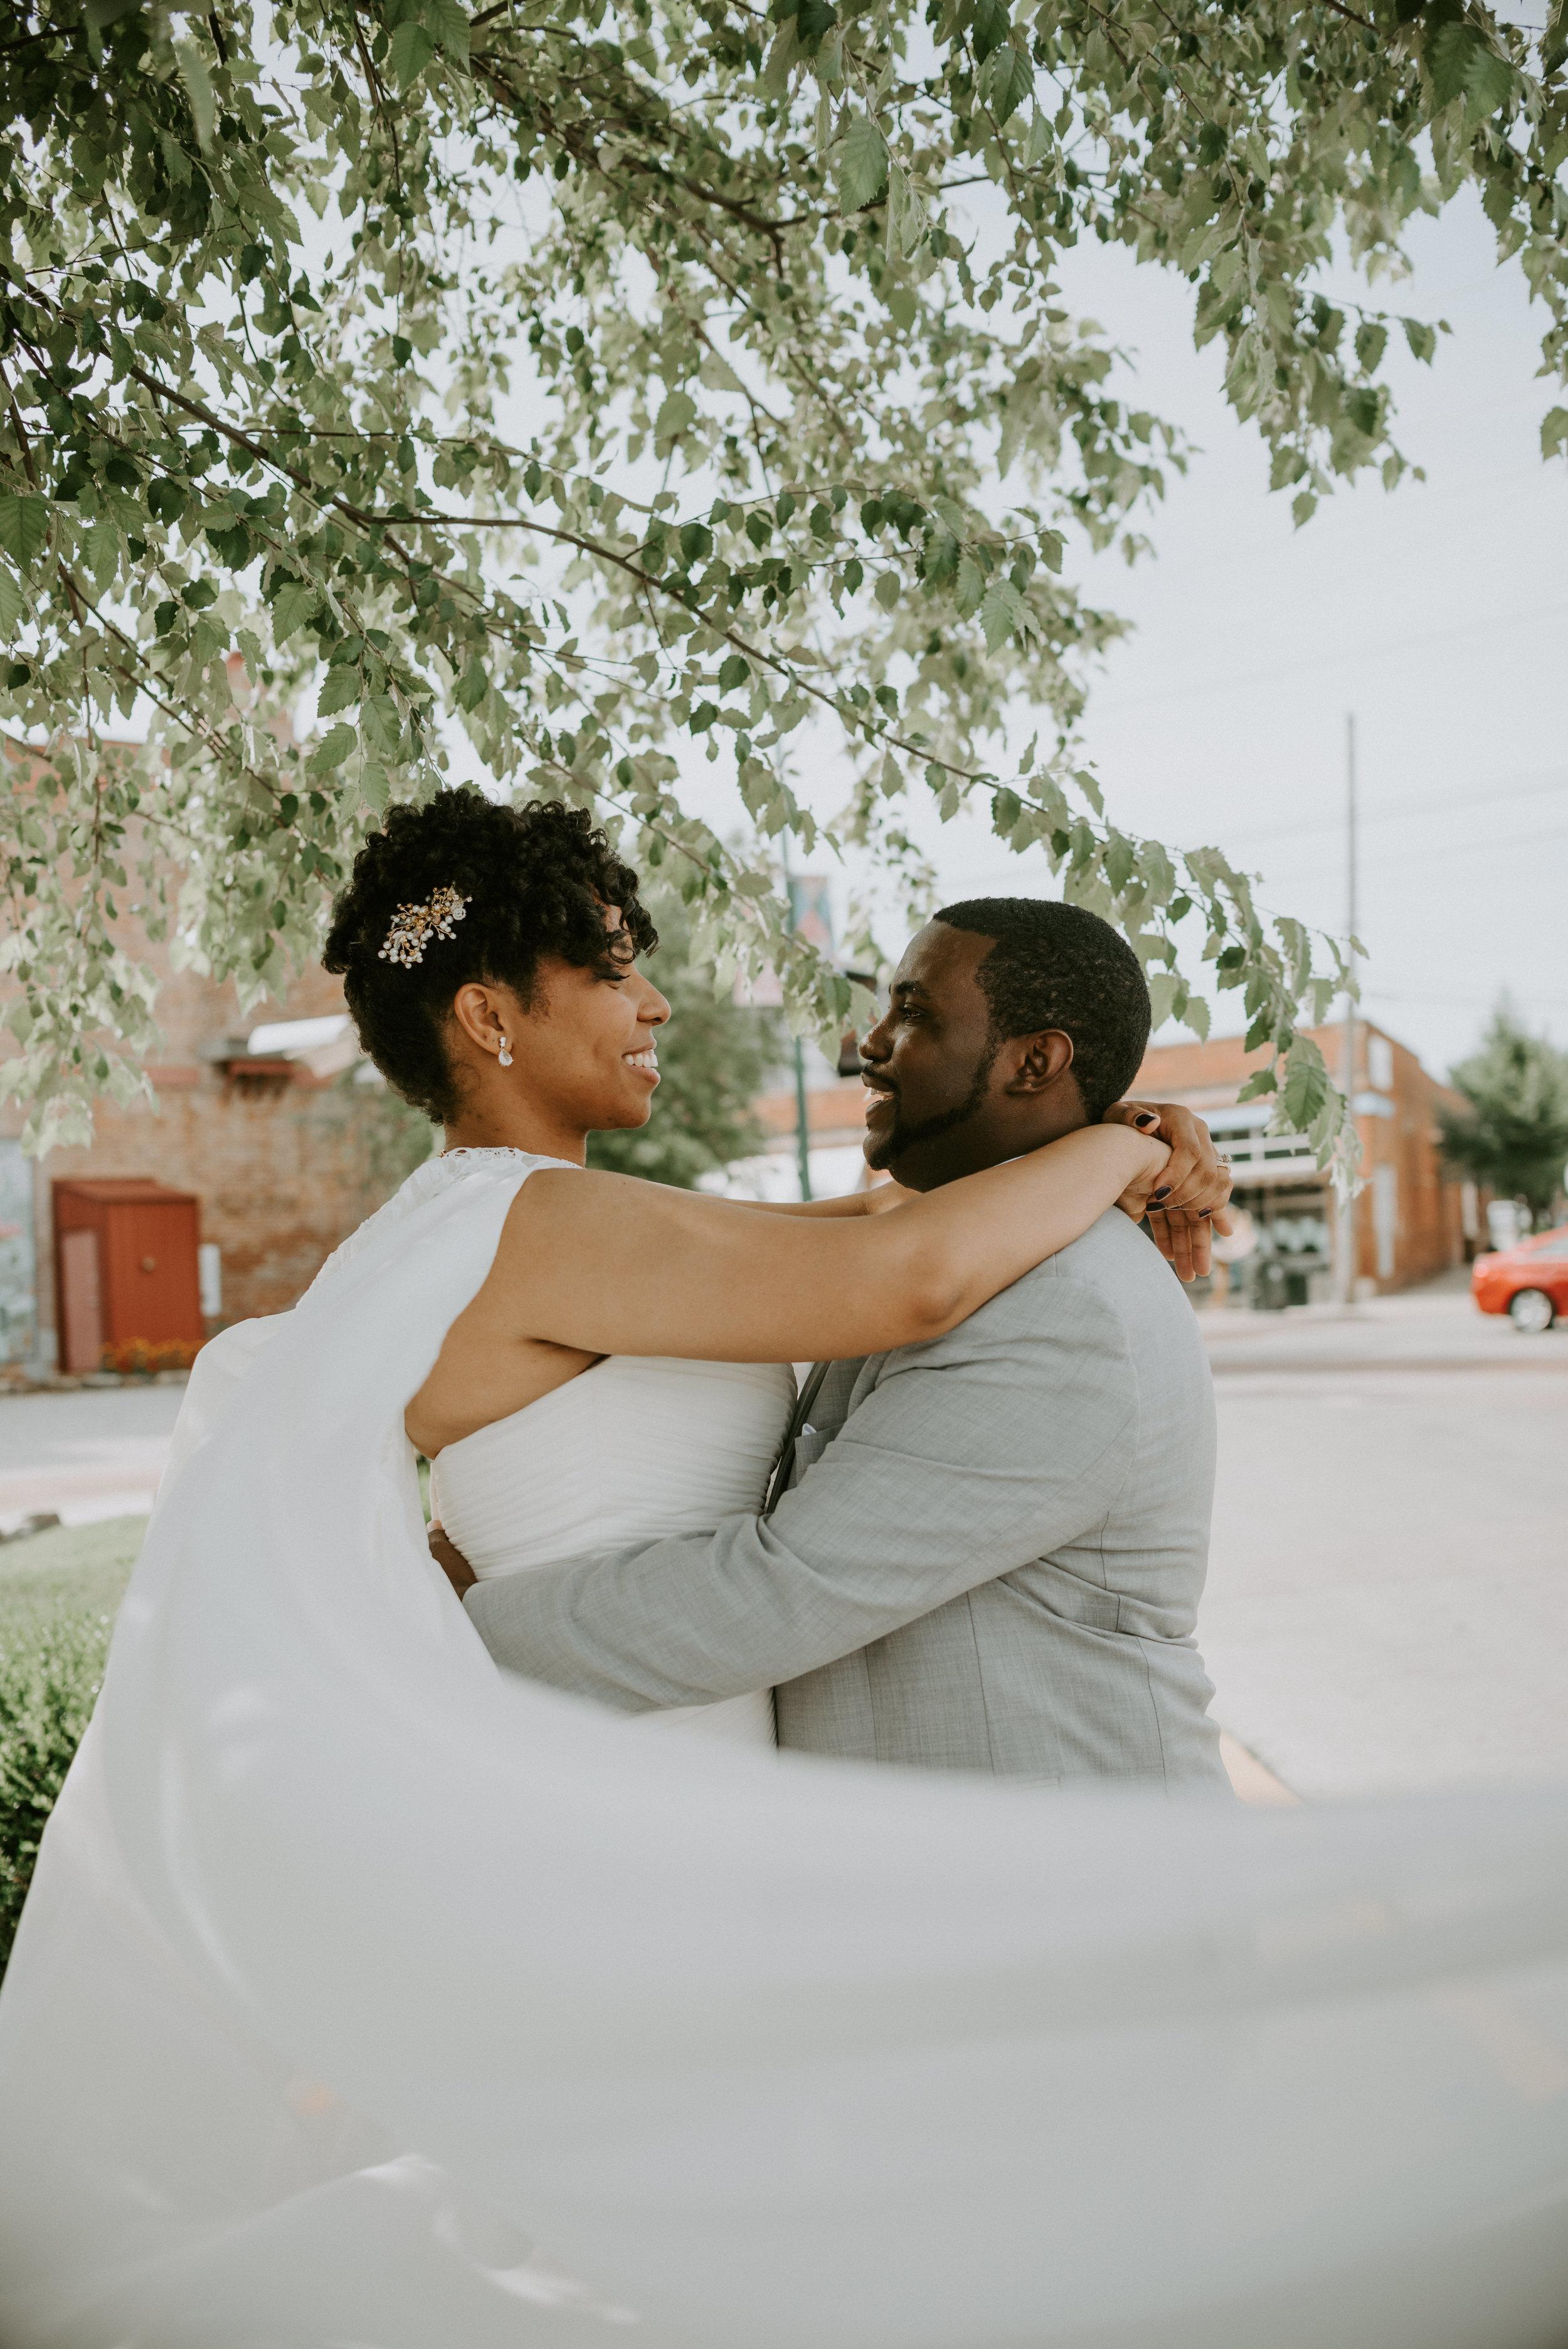 WonderlyCreative_Wedding_6.7.18_Khara&Dwayne_-725.jpg